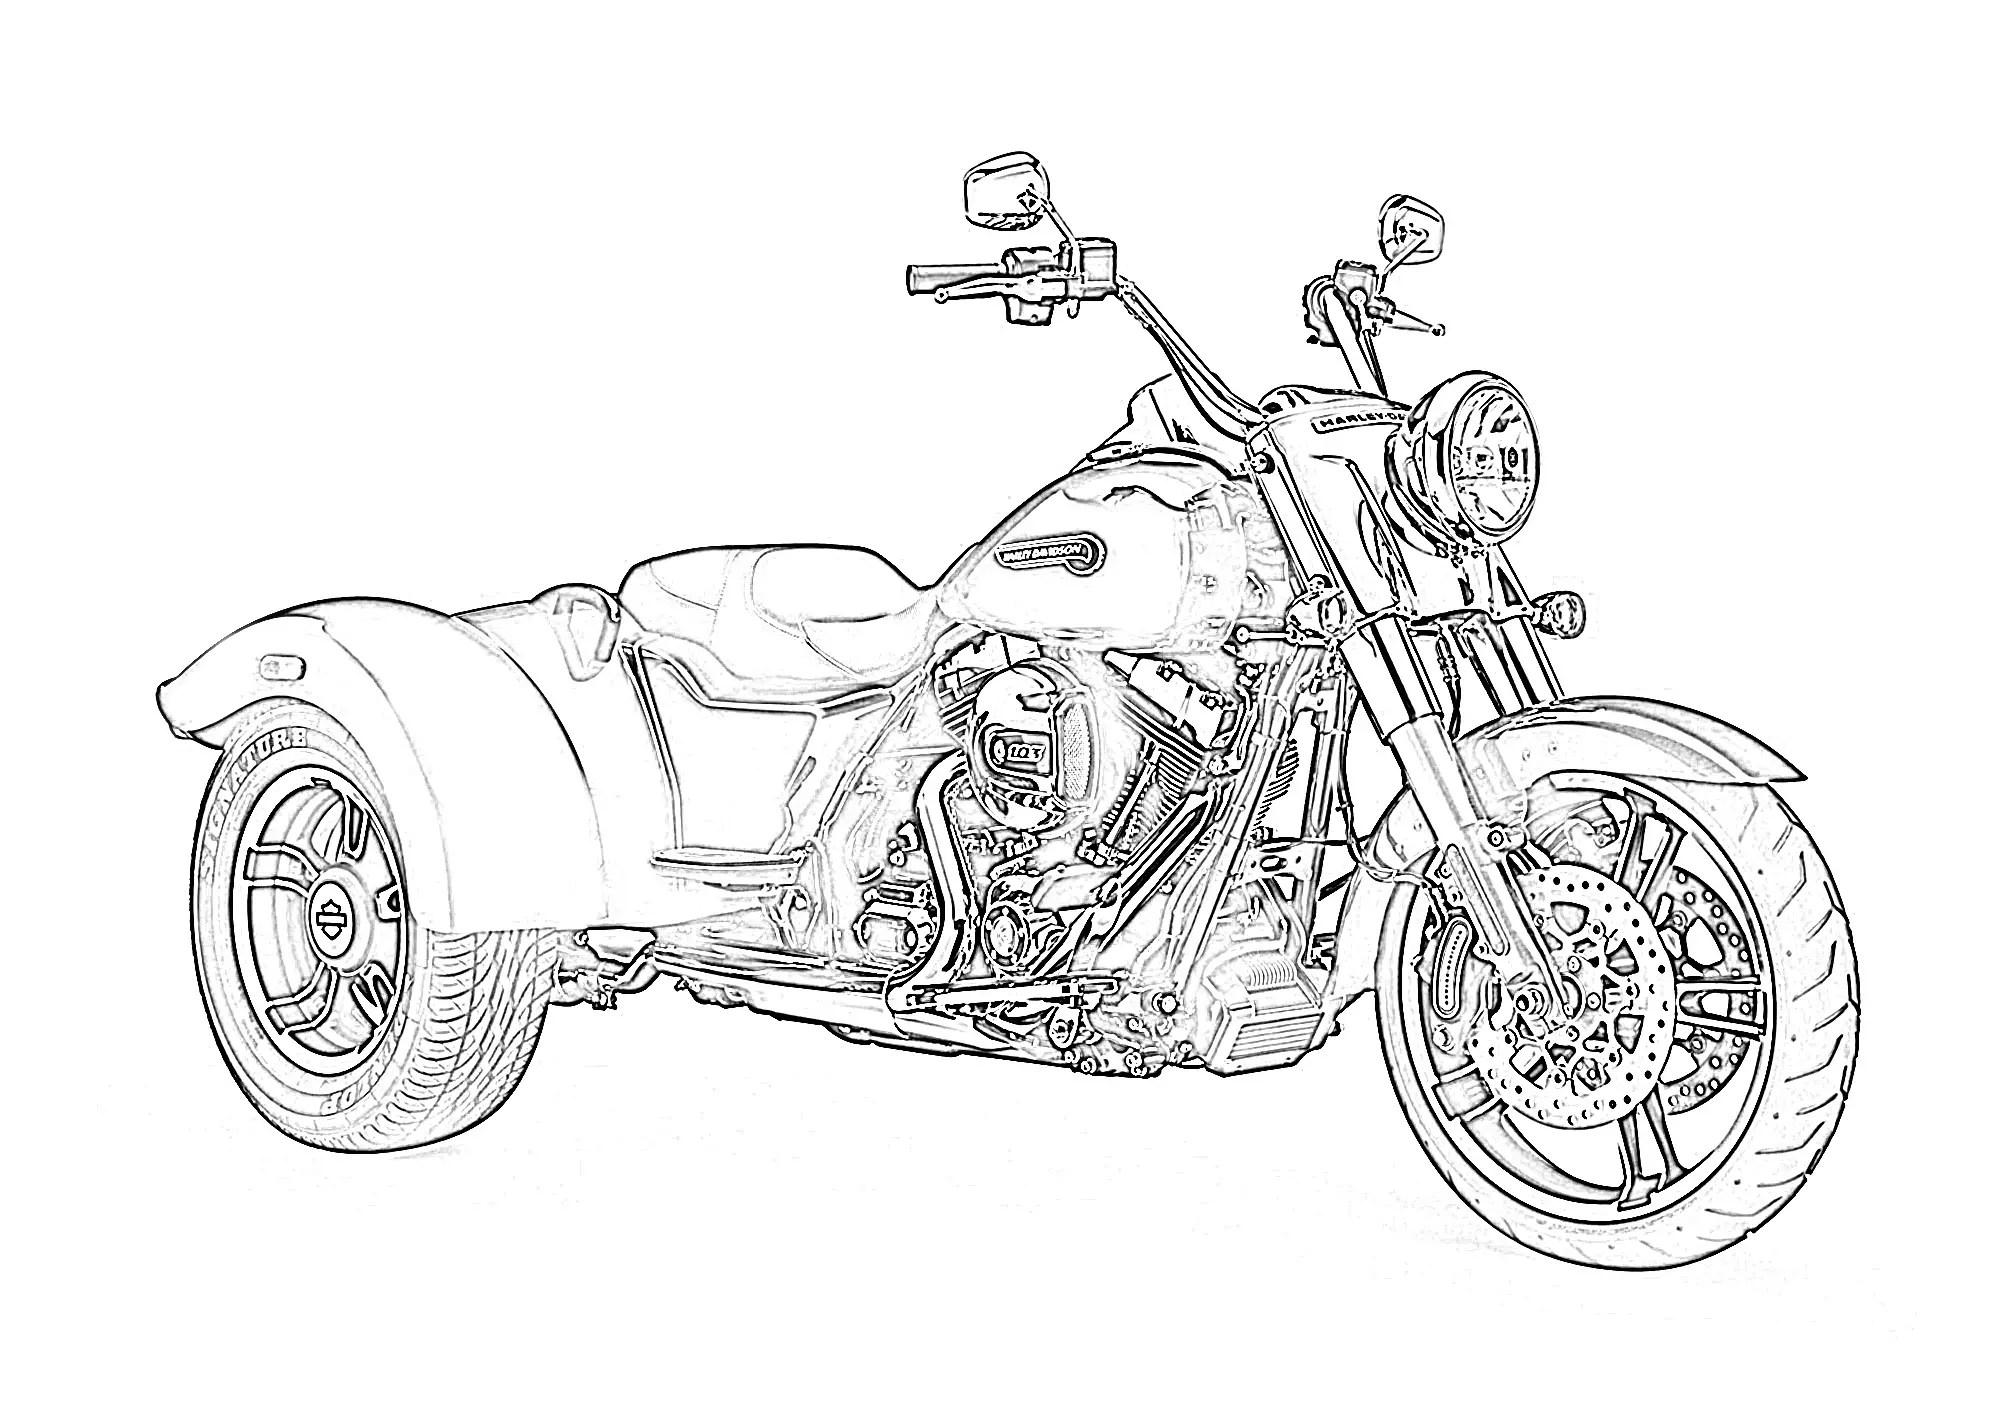 Harley Davidson Engine Dimension Diagram